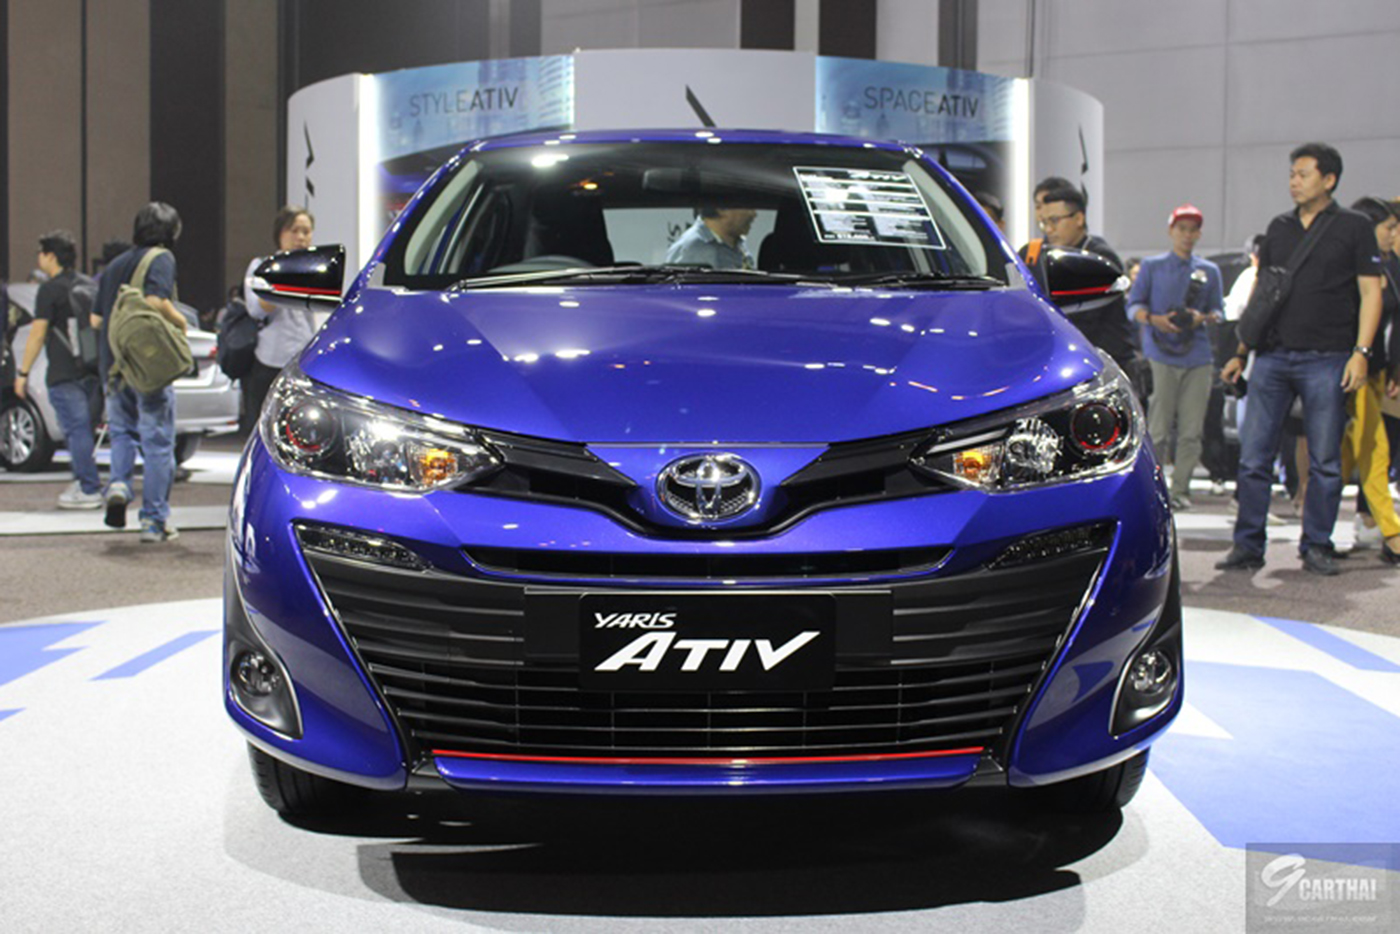 toyota-yaris-sedan-2018-1.jpg